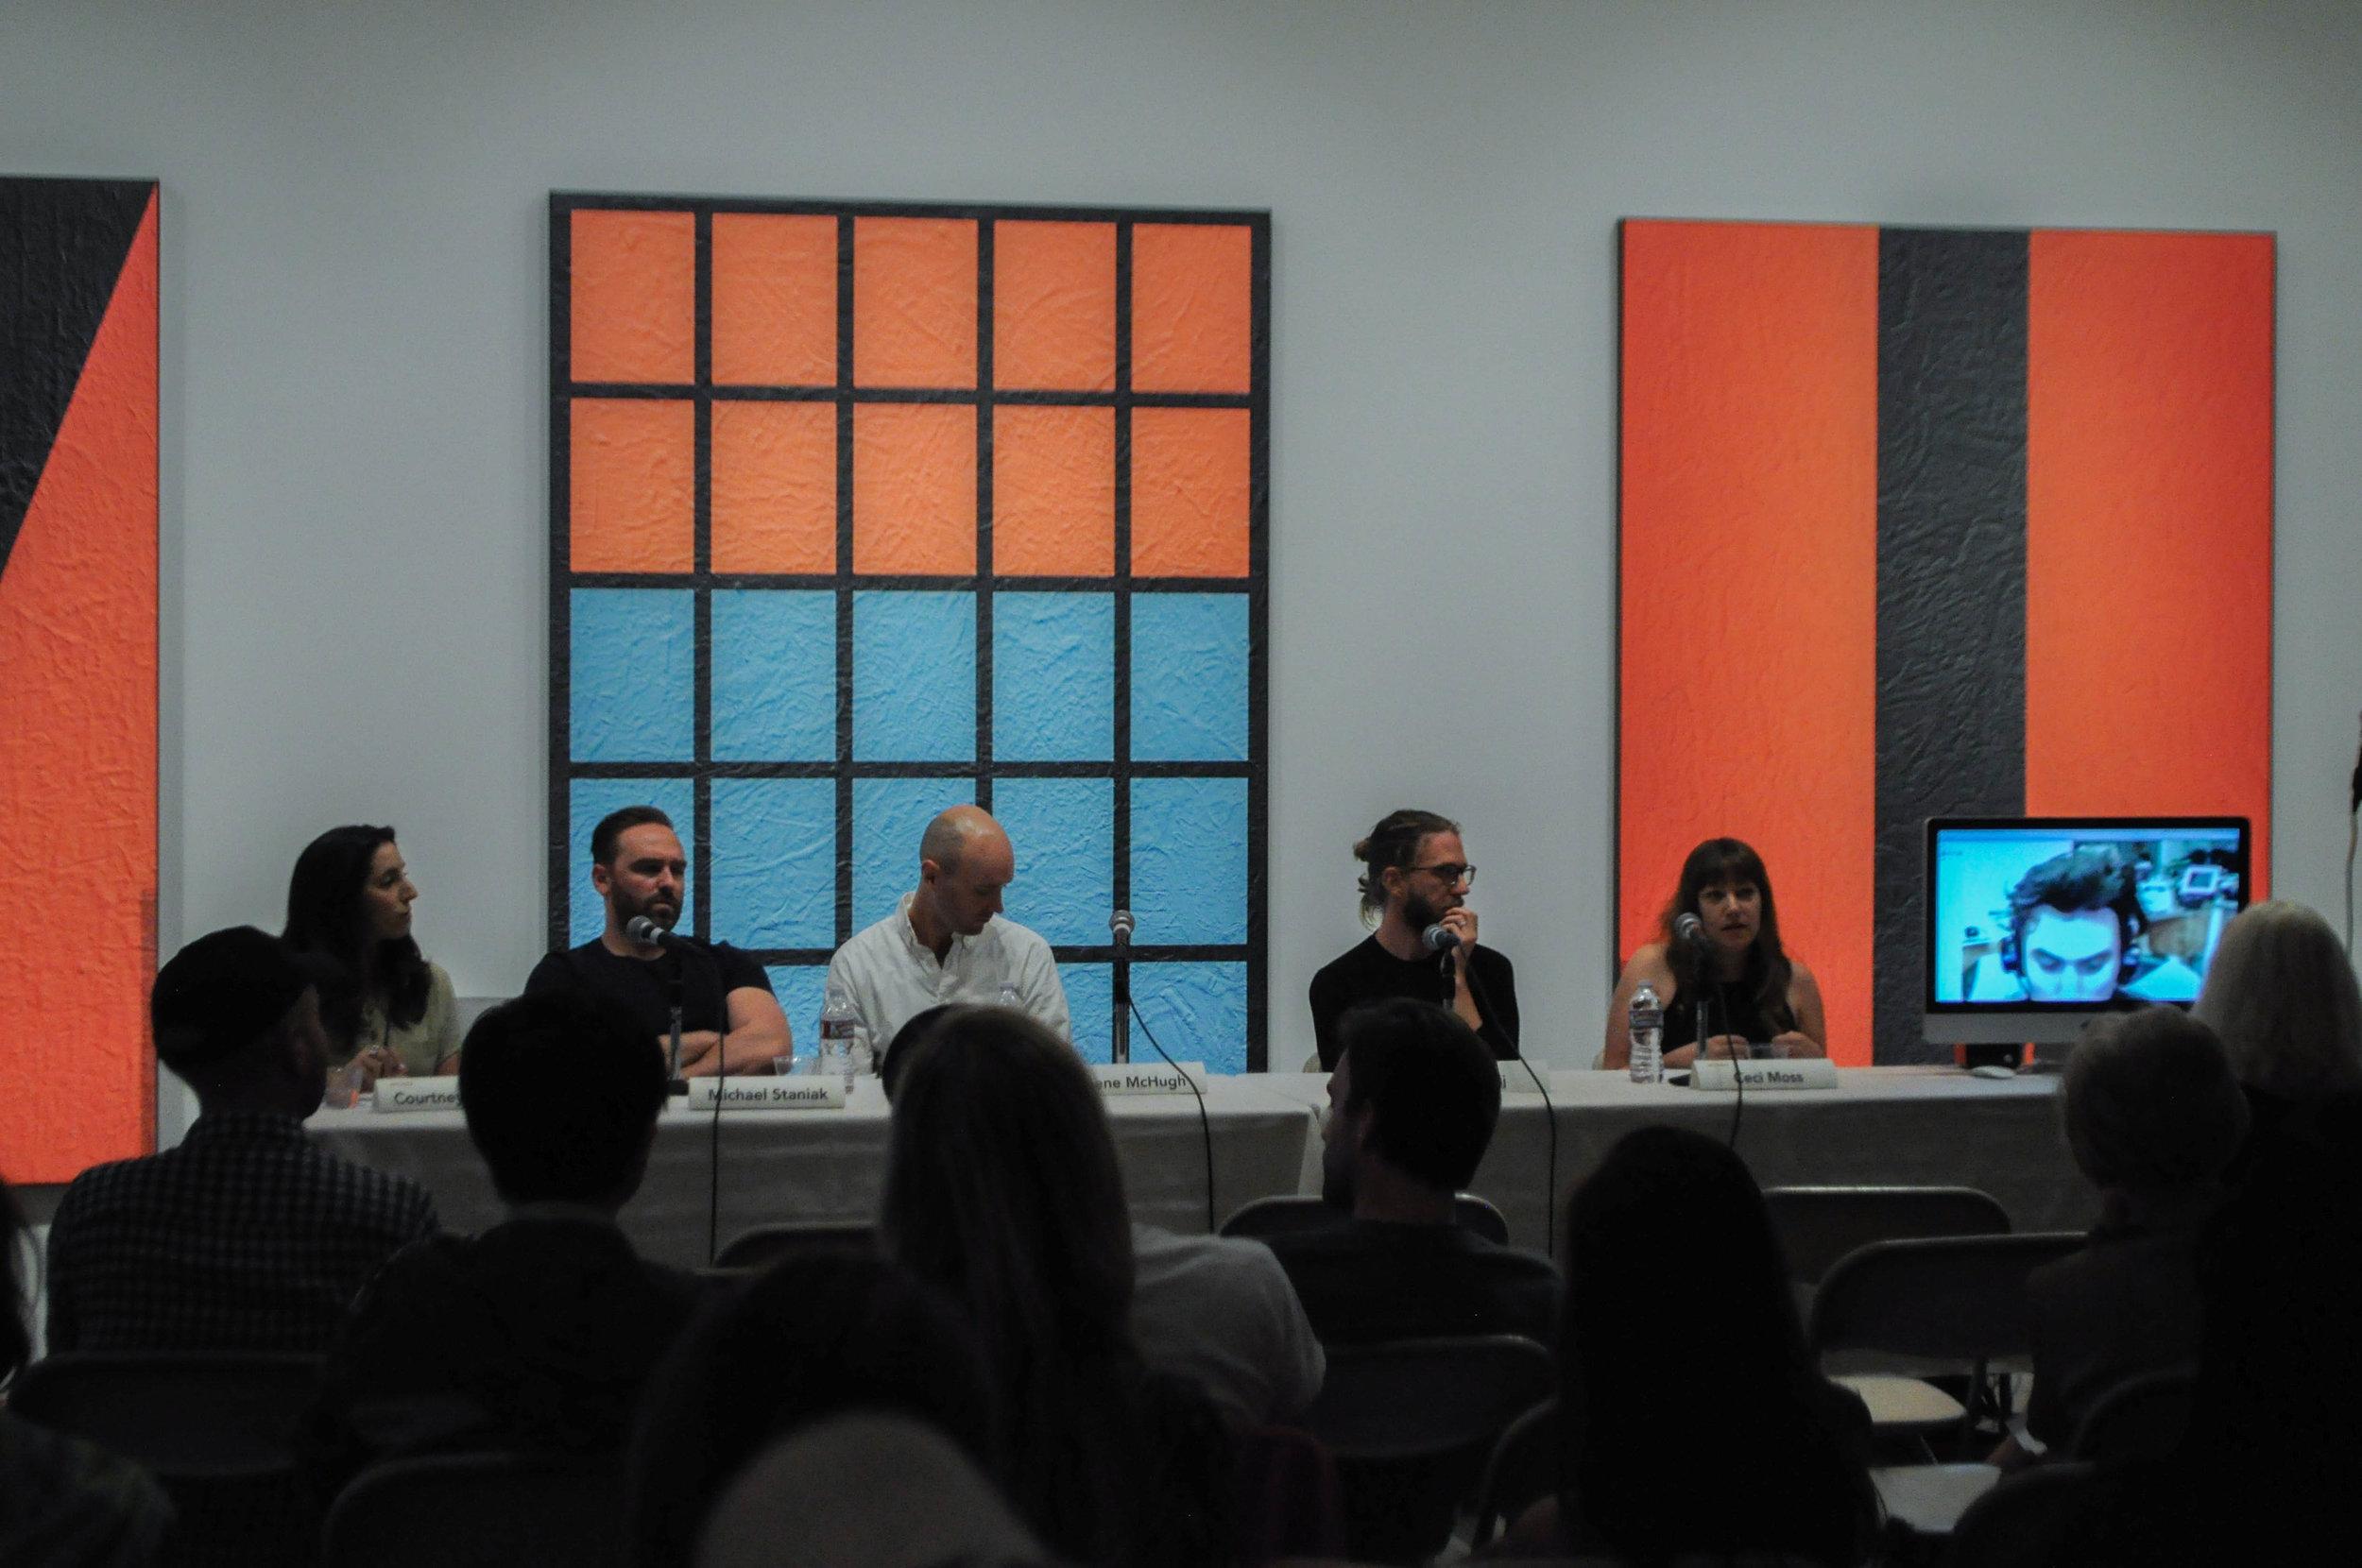 (from left to right): Courtney Malick, Michael Staniak, Gene McHugh, Jeff Baij, Ceci Moss, Ryder Ripps